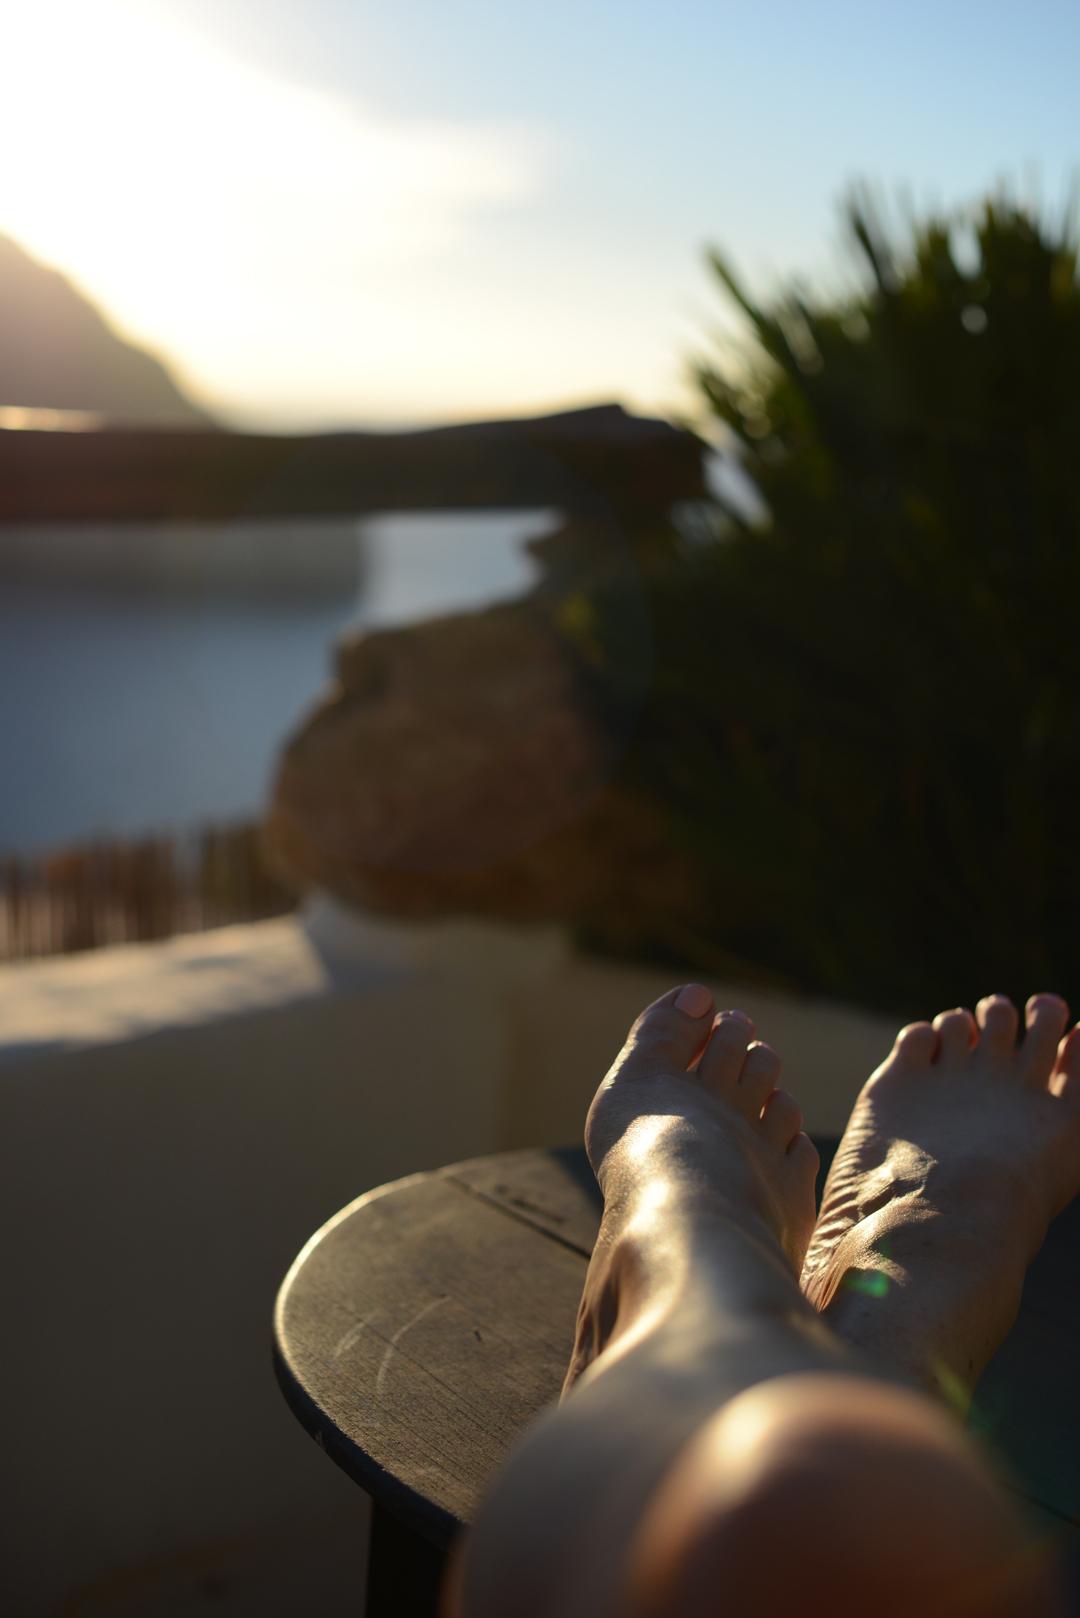 sara delaney relaxing in a luxury suite at hacienda na xamena in ibiza